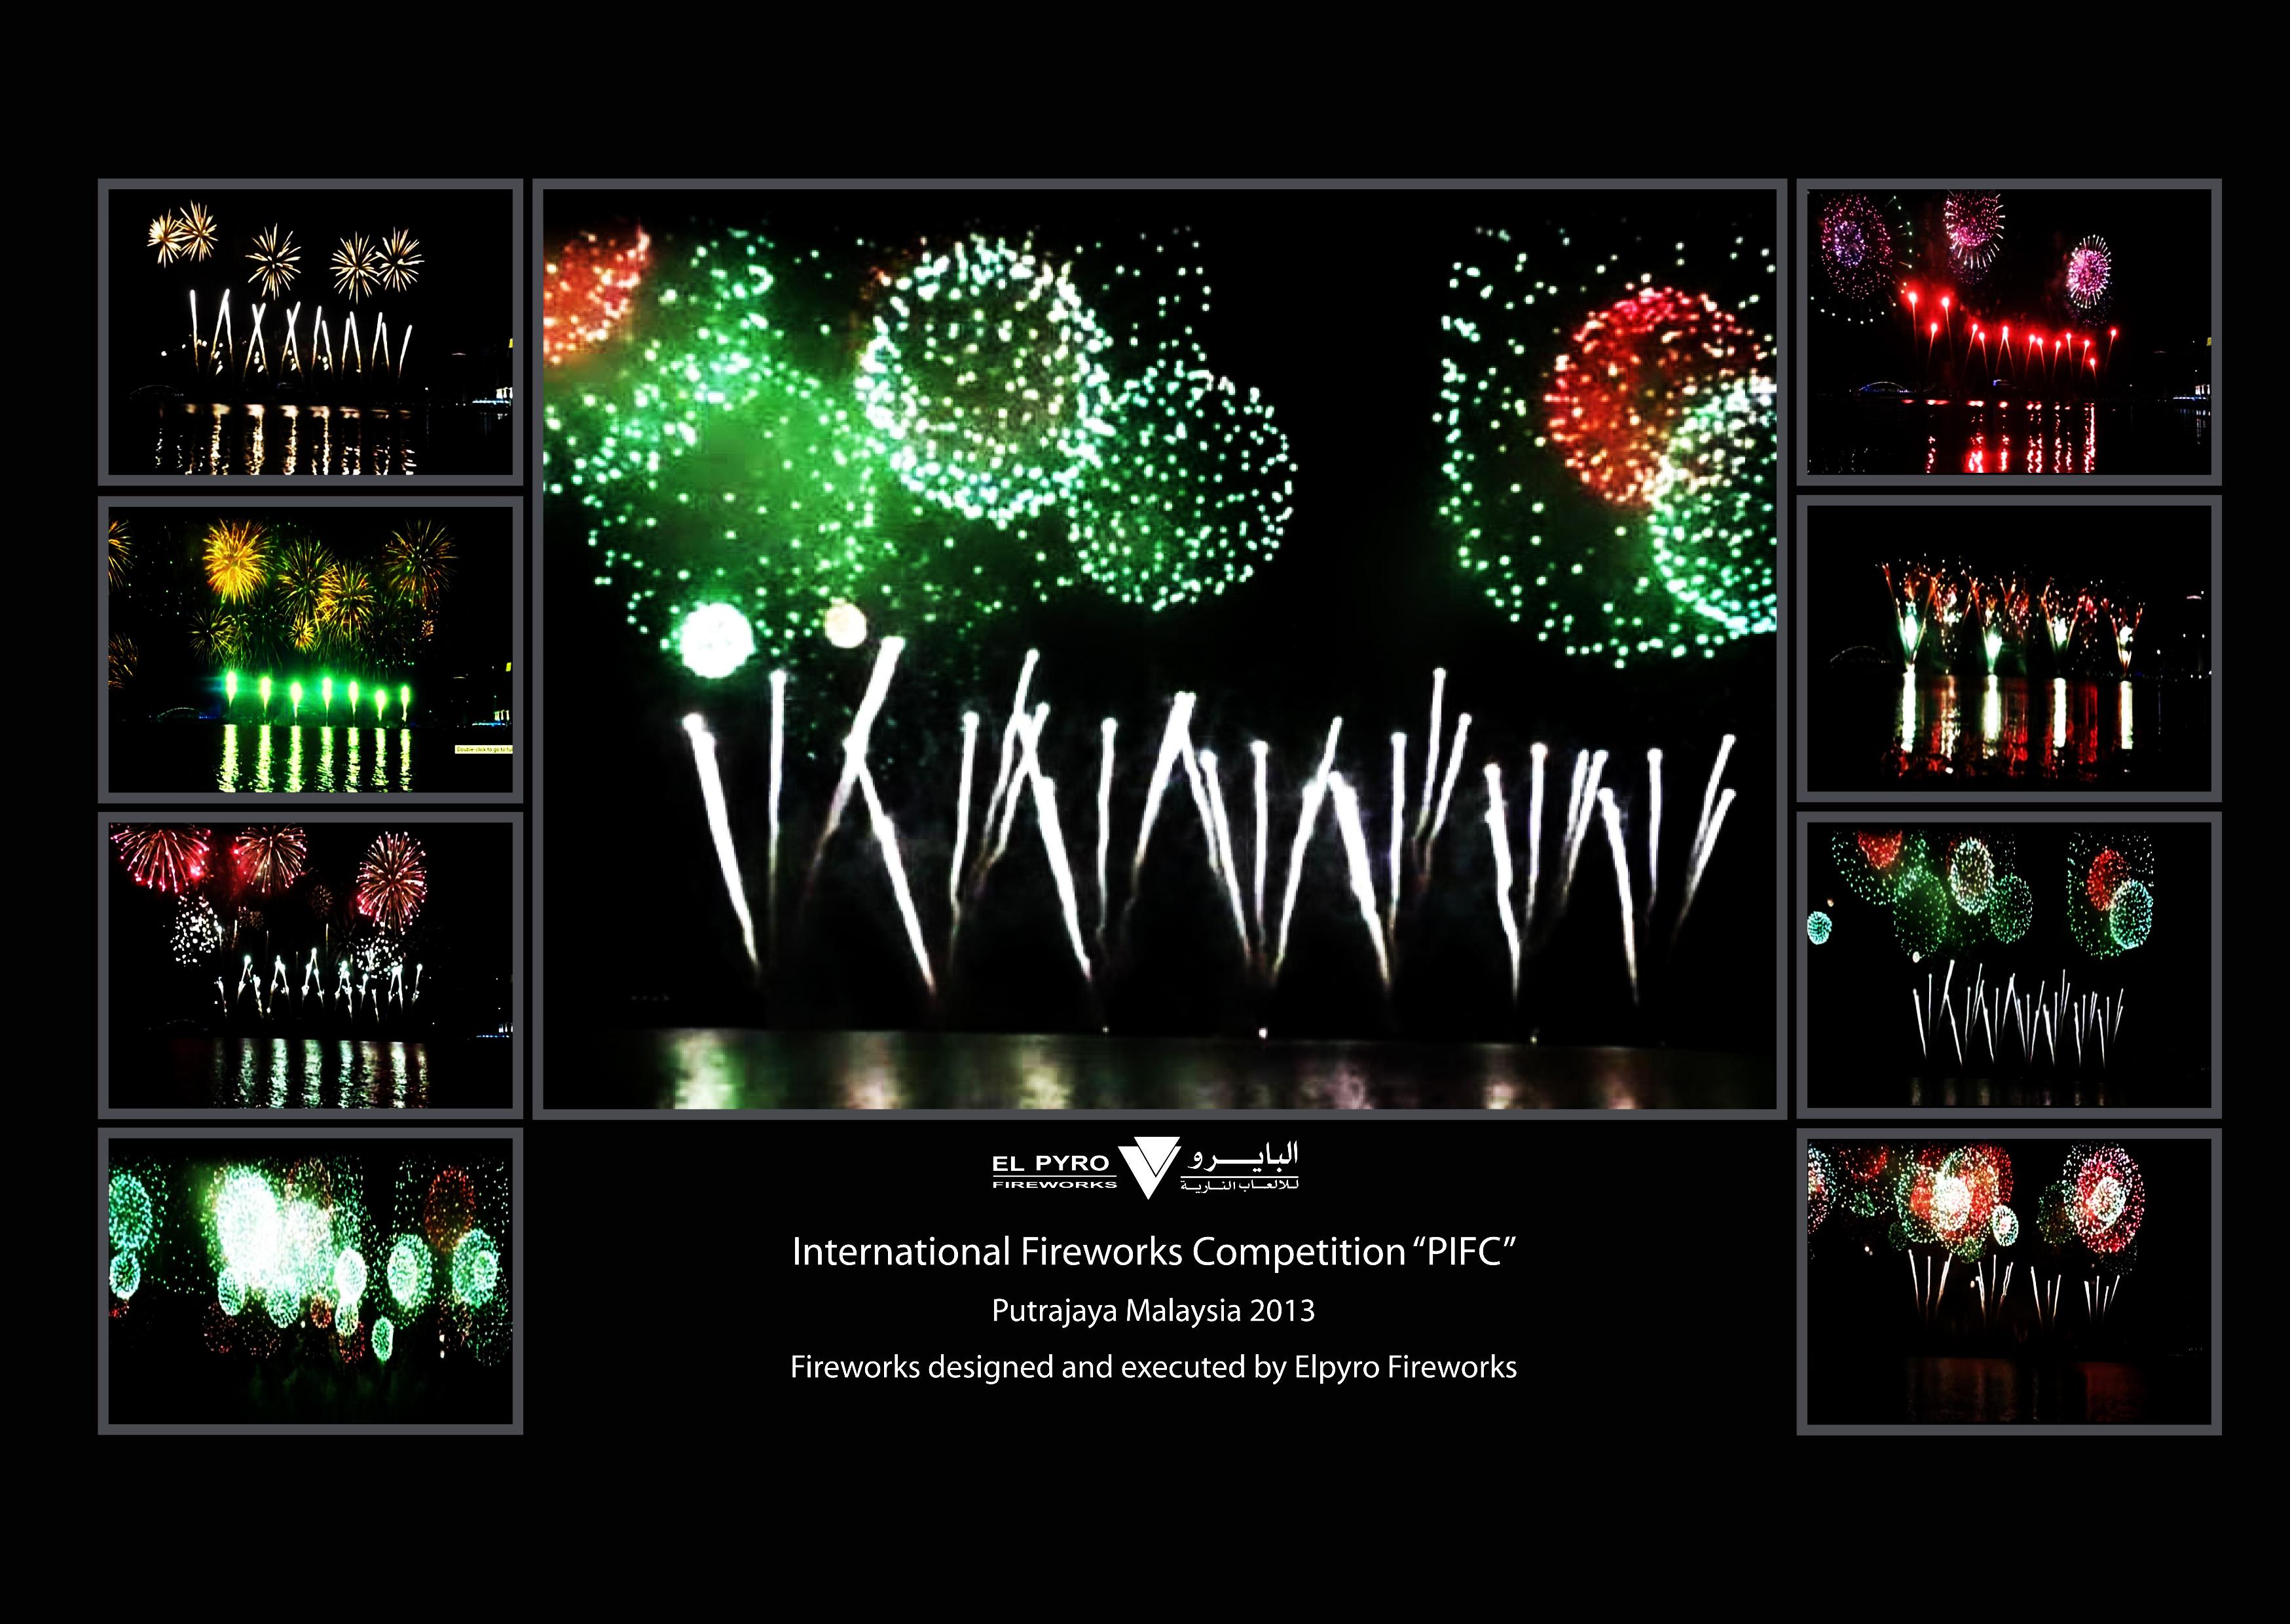 Putrajaya-Fireworks Competition